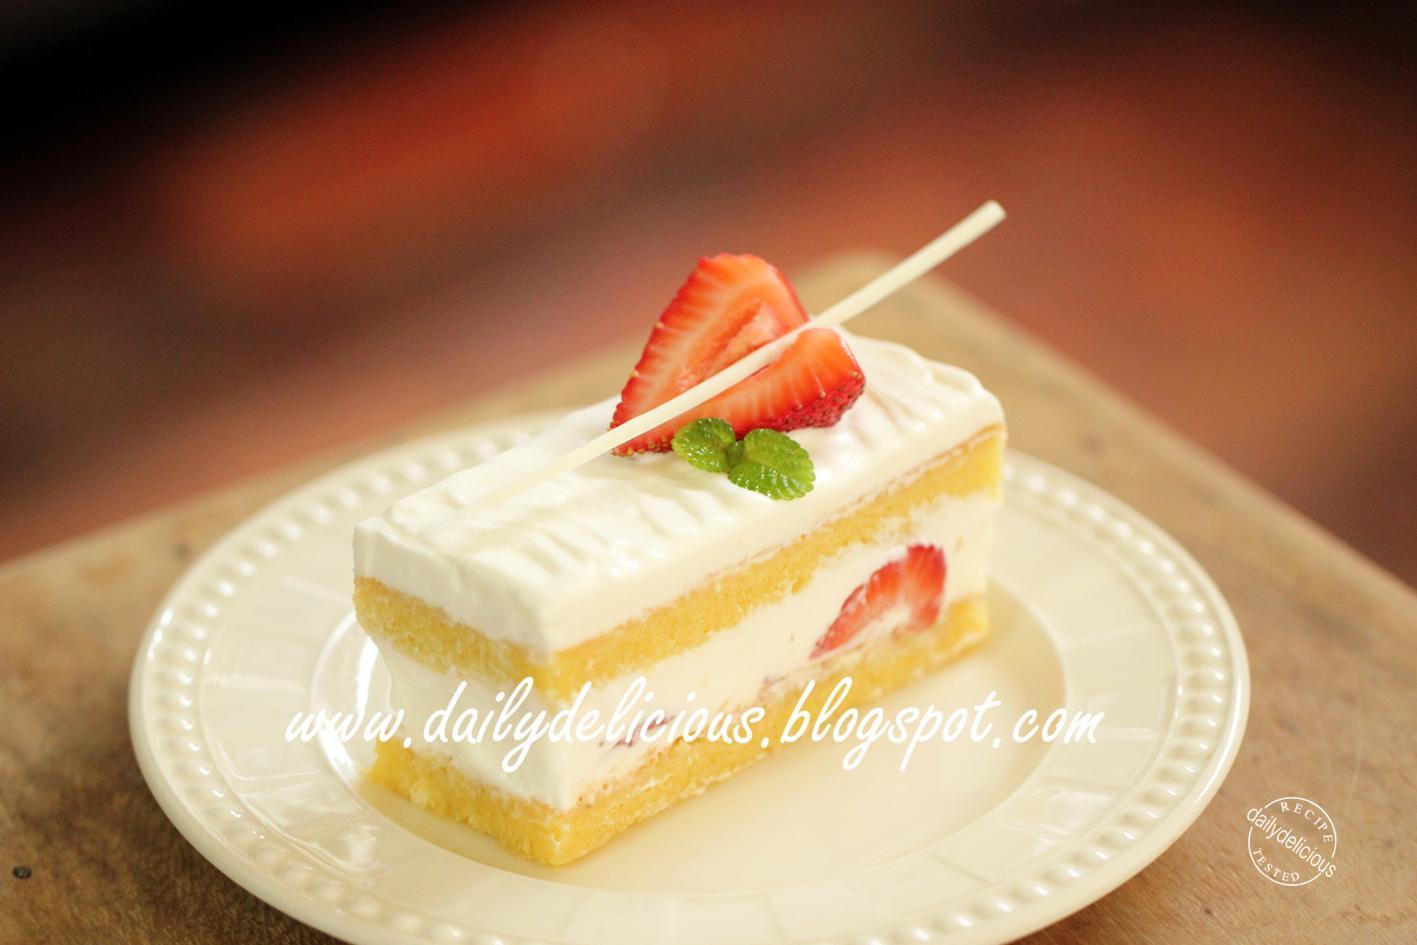 Strawberry Sponge Cake How To Make The Cream